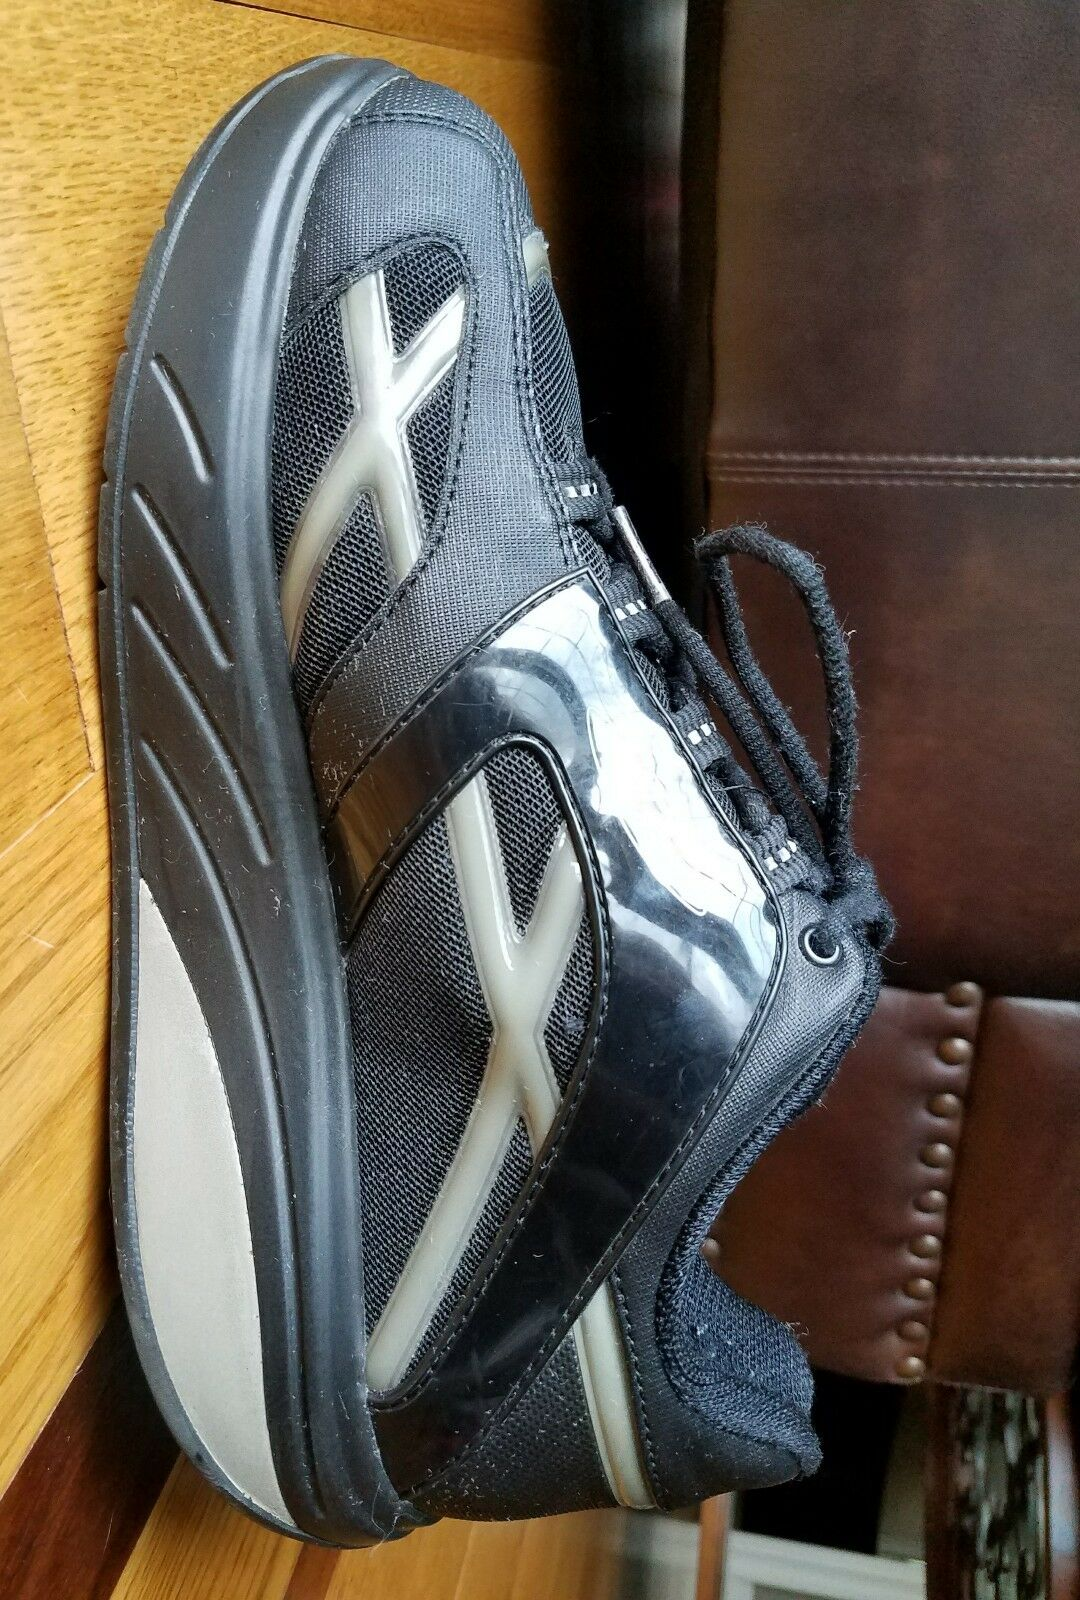 MBT Women's Black Striped Rocker Sneaker Athletic shoes     400108-46 Size 9.5 fdf3e1